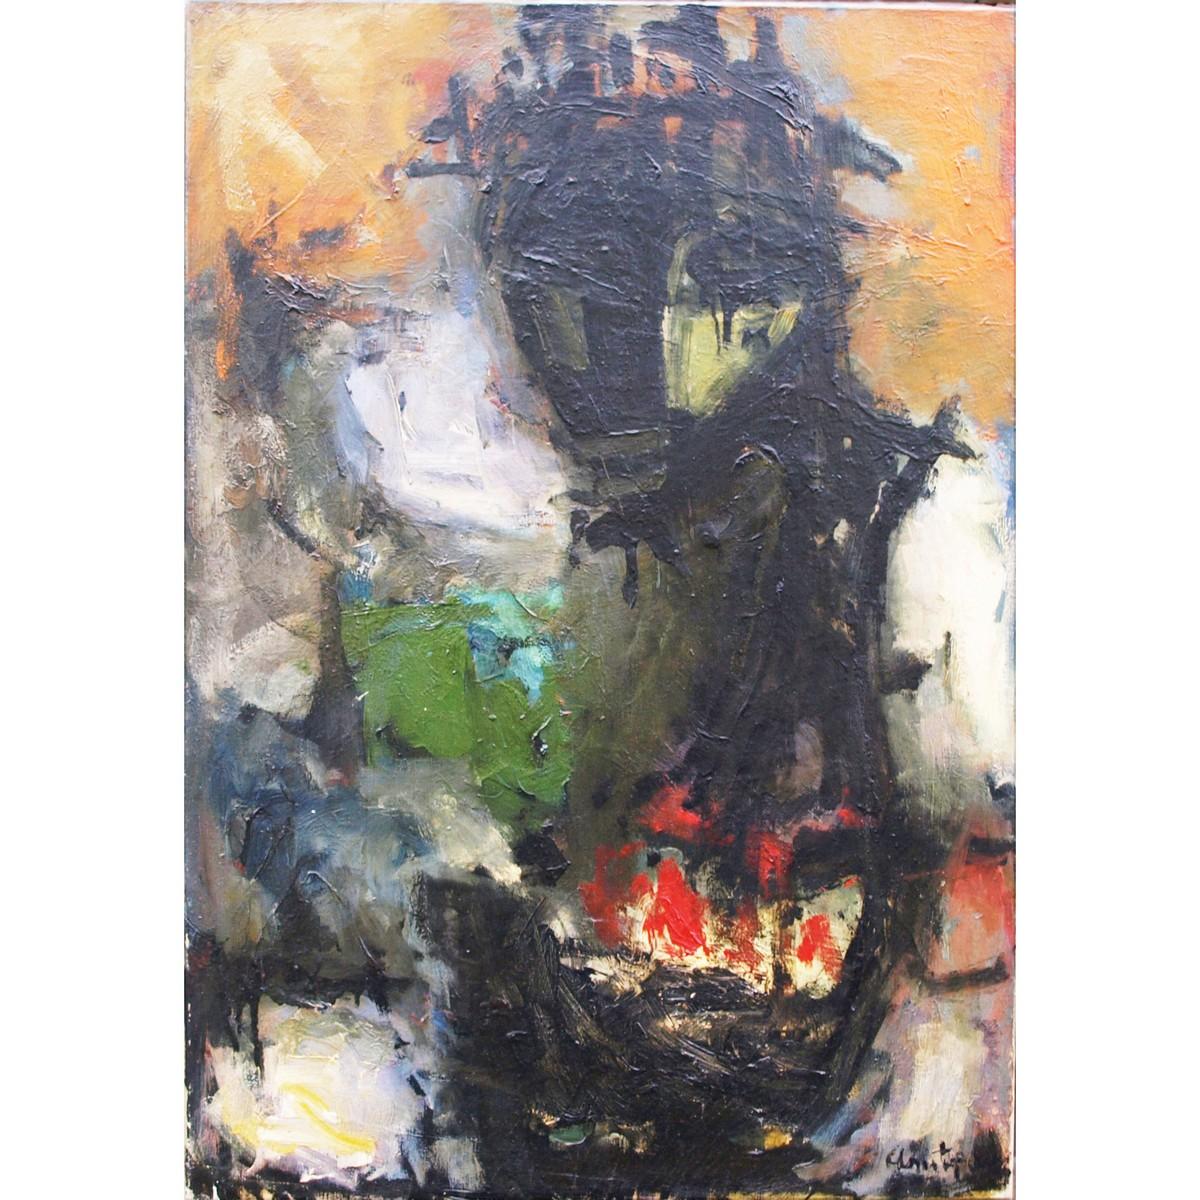 Lot 11 - Christophorou, John 1921-2014 French/Greek AR, Figure